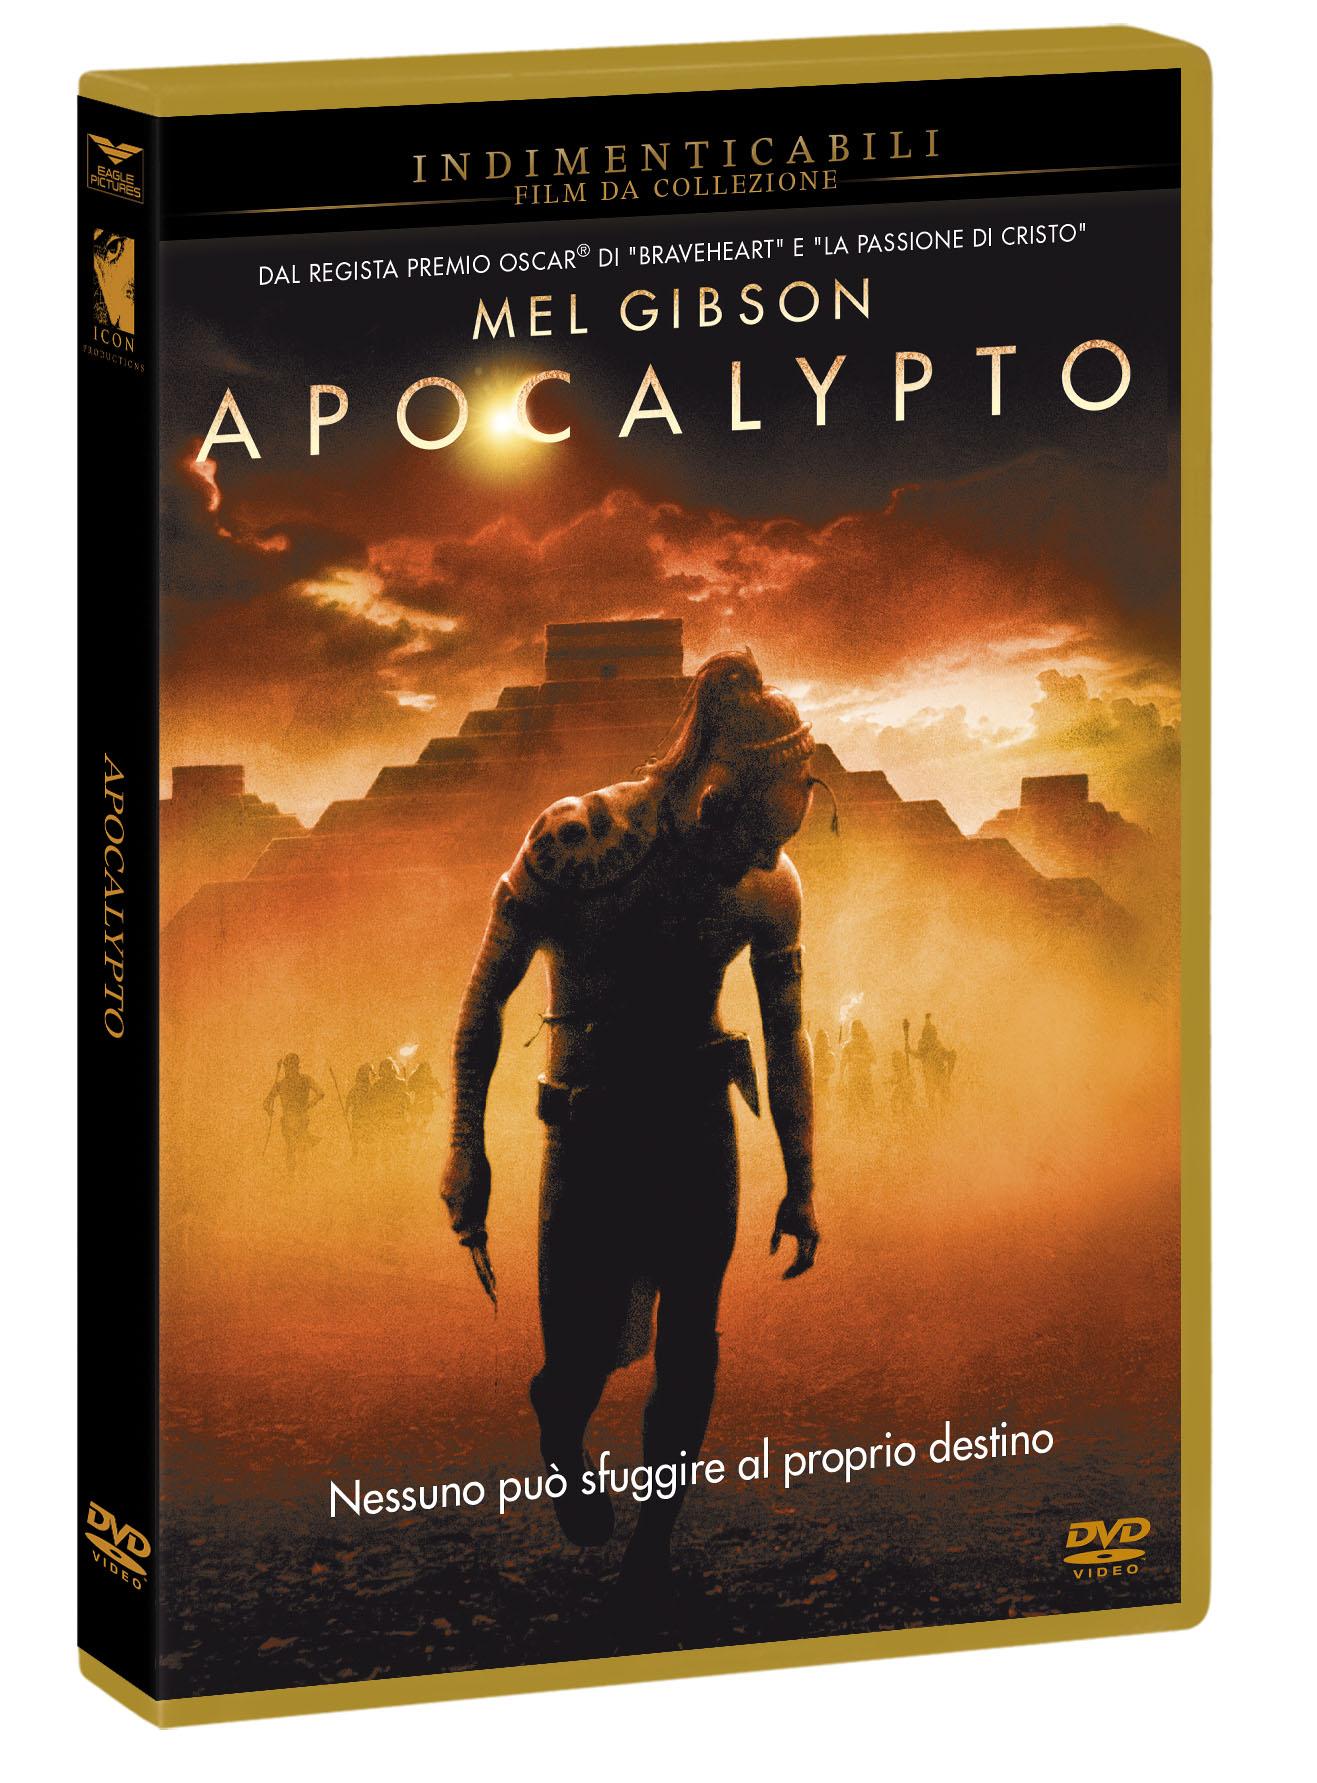 APOCALYPTO (INDIMENTICABILI) (DVD)